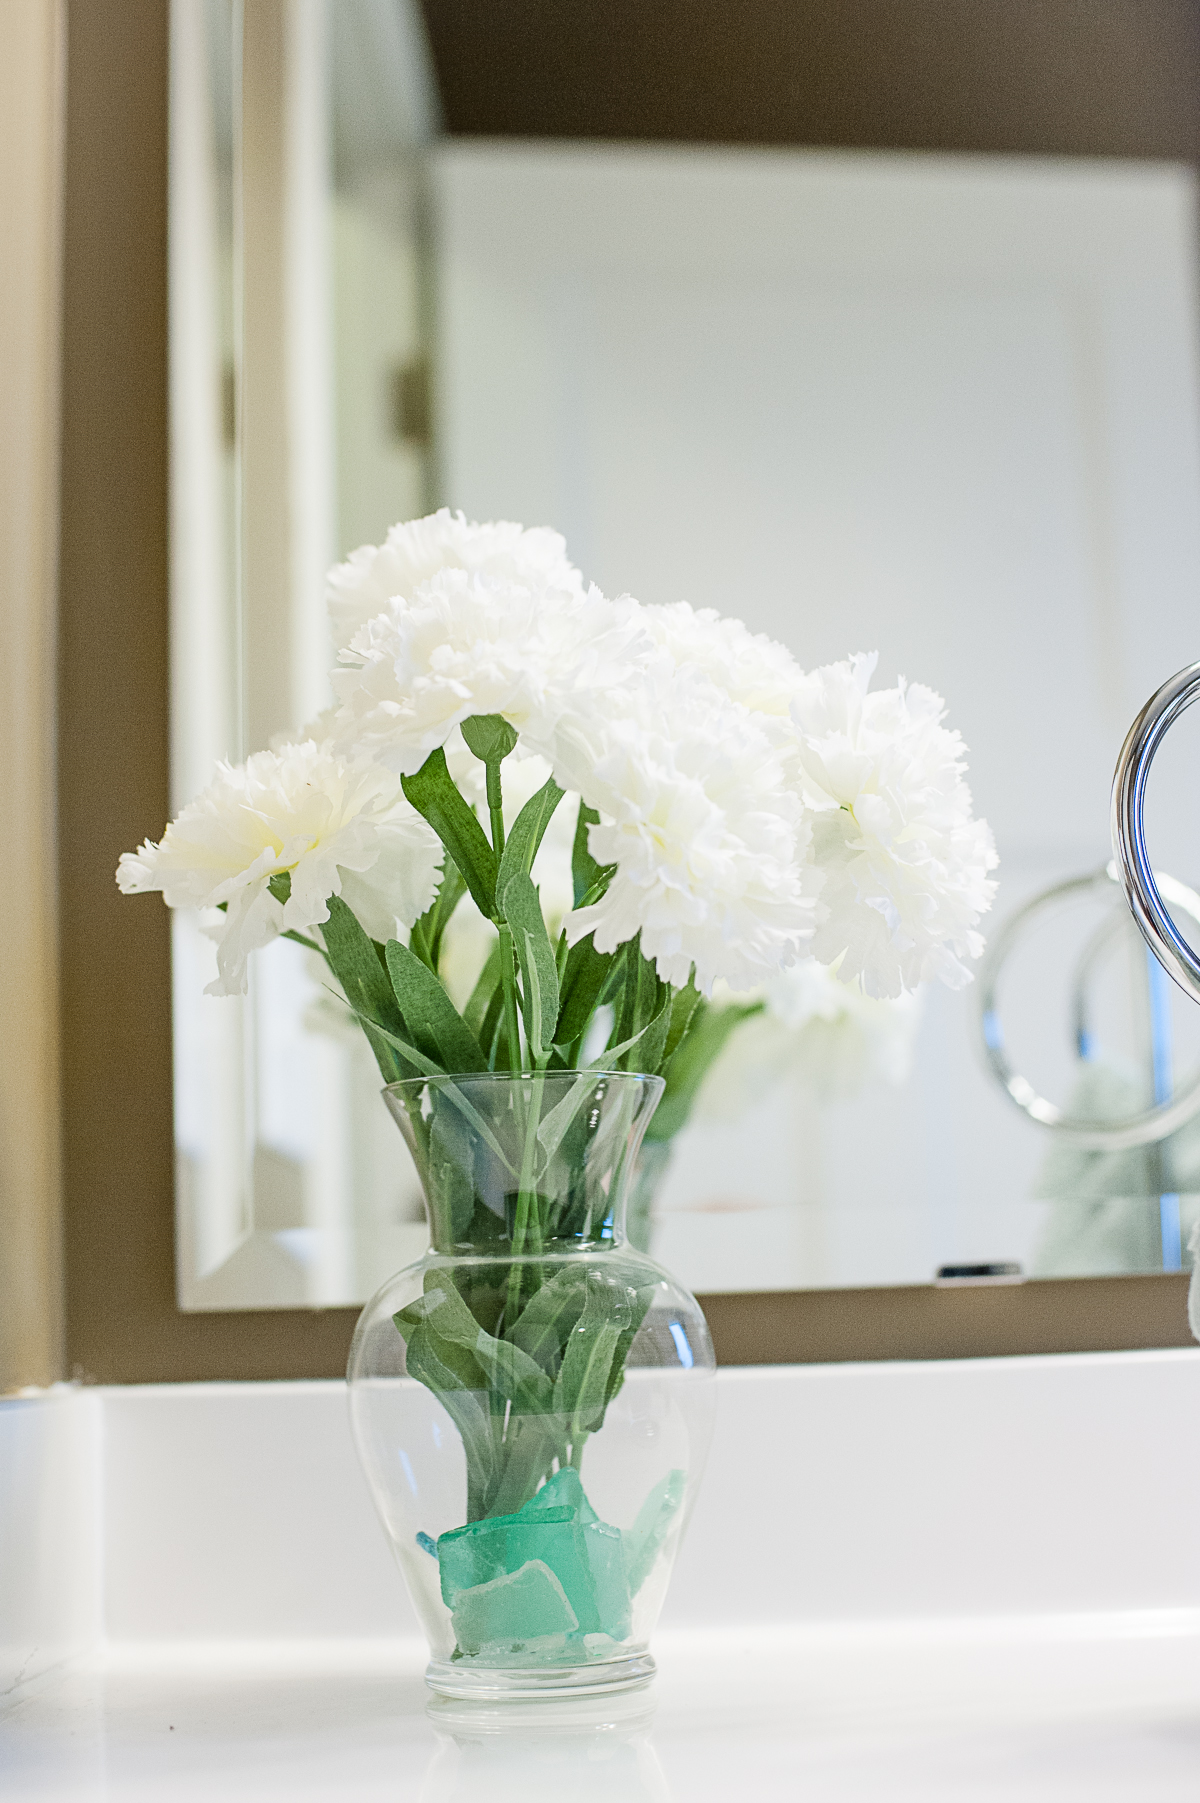 Ramsey house bathroom-4x6-8354.jpg